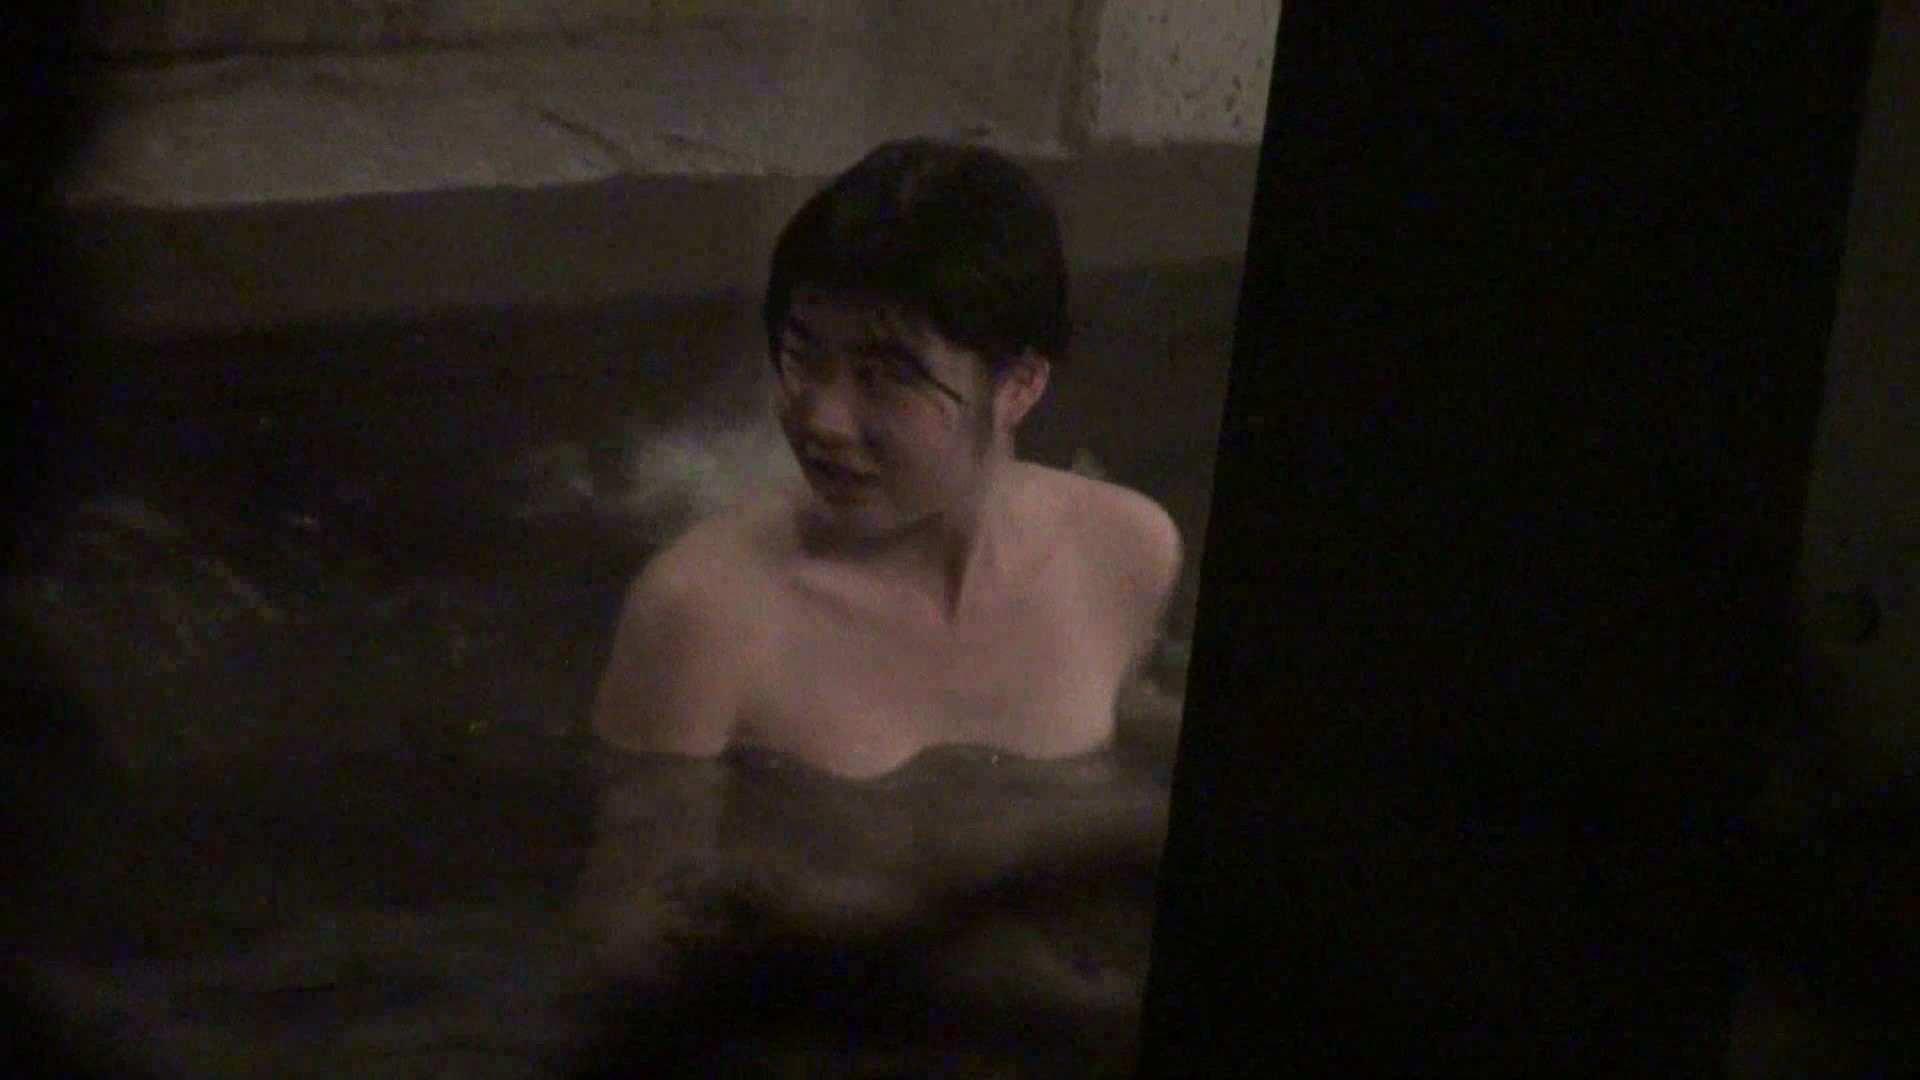 Aquaな露天風呂Vol.343 露天 | OL女体  91連発 64